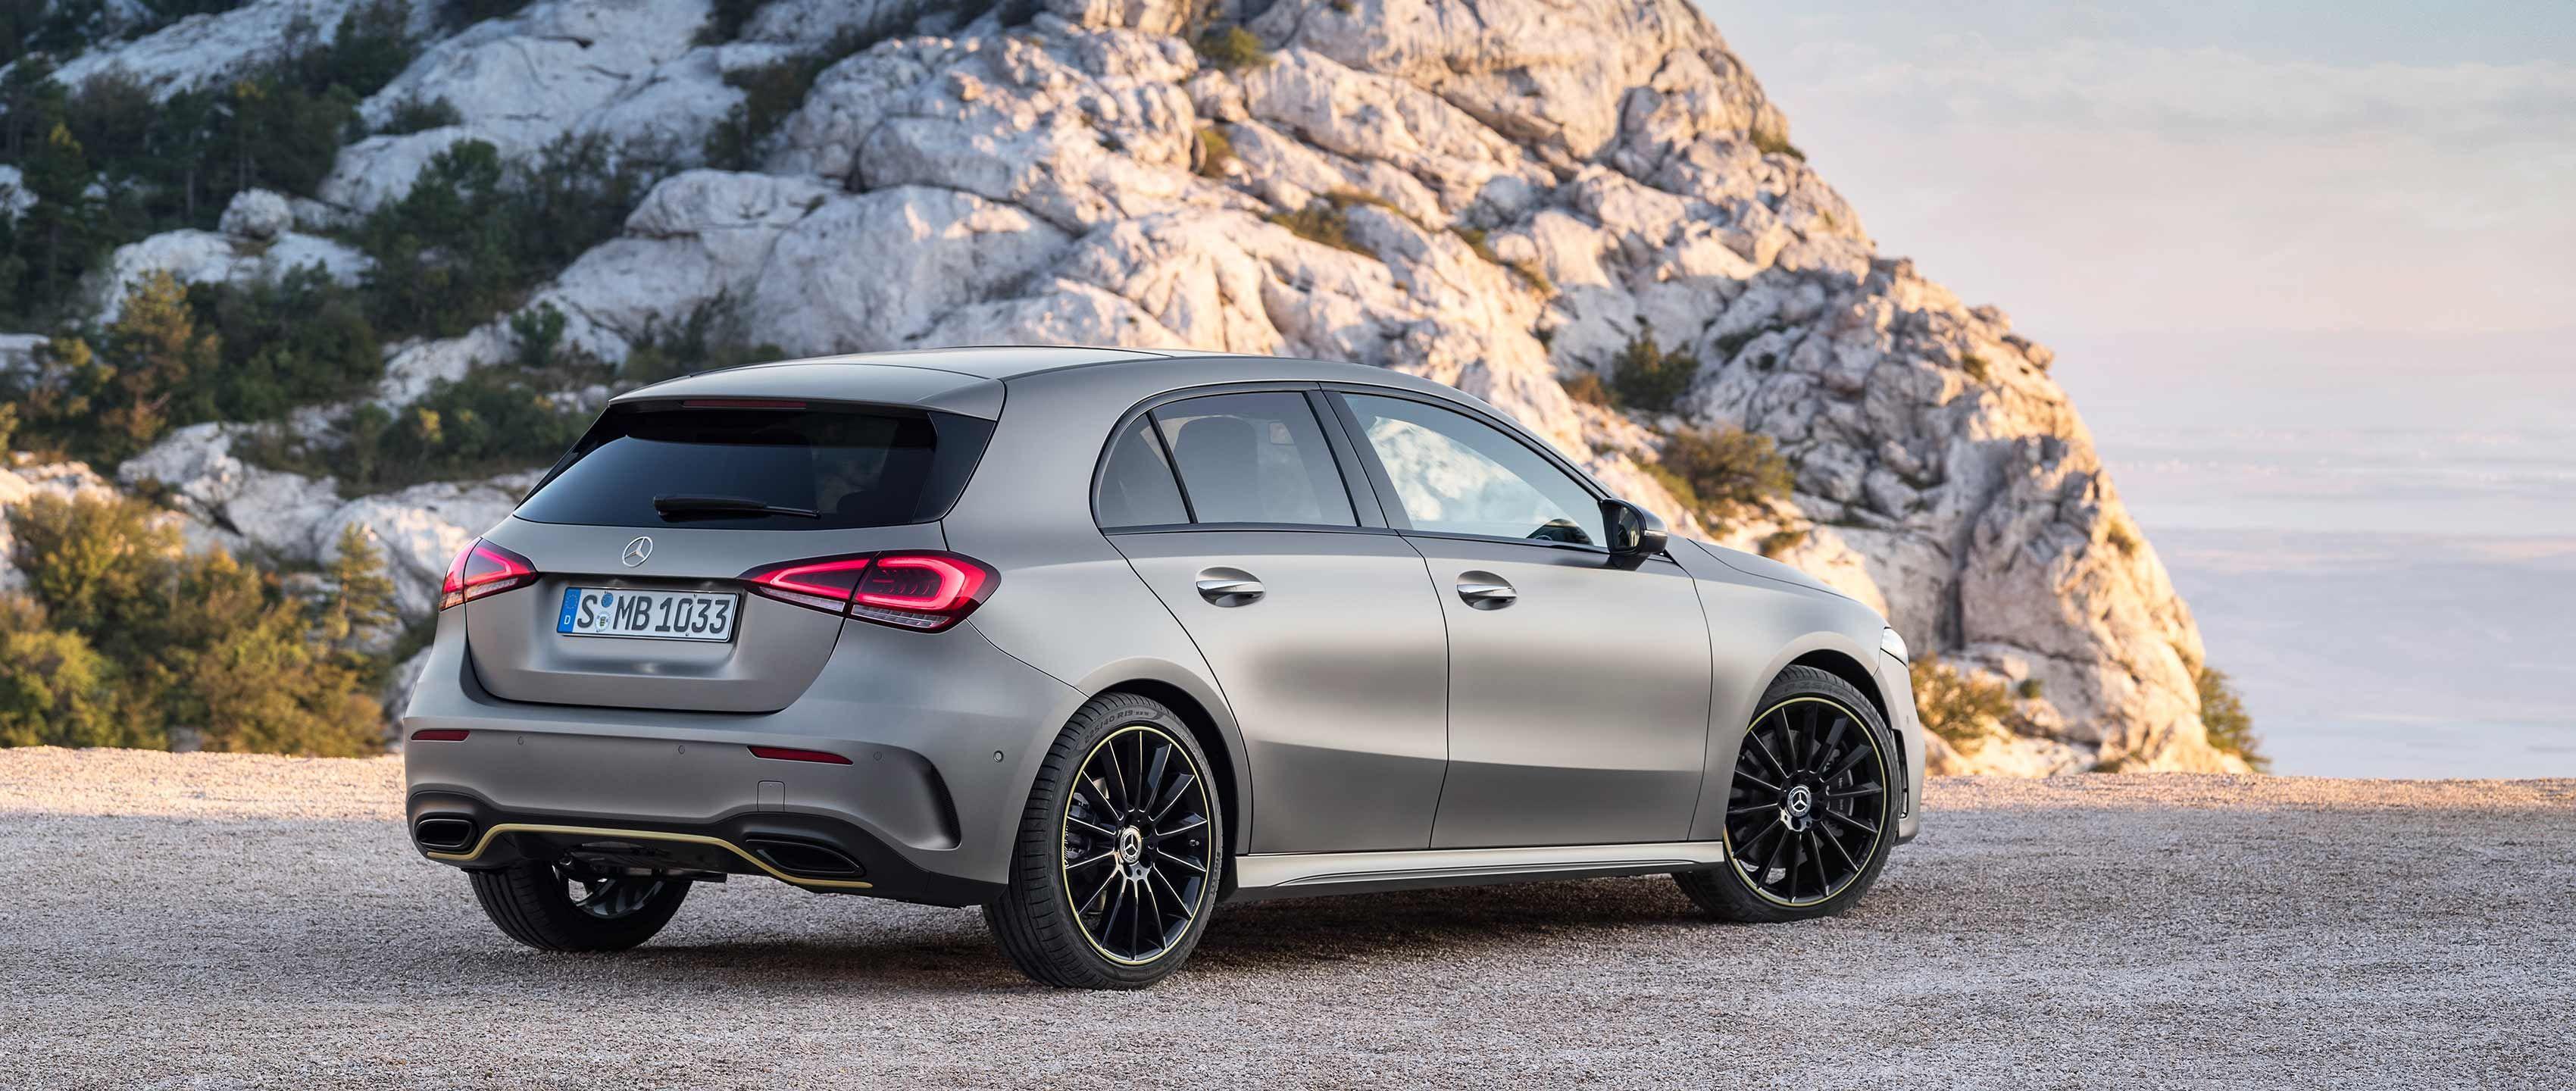 سياره مرسيدس بنز بي كلاس 2019 Benz A Class Mercedes Benz Benz